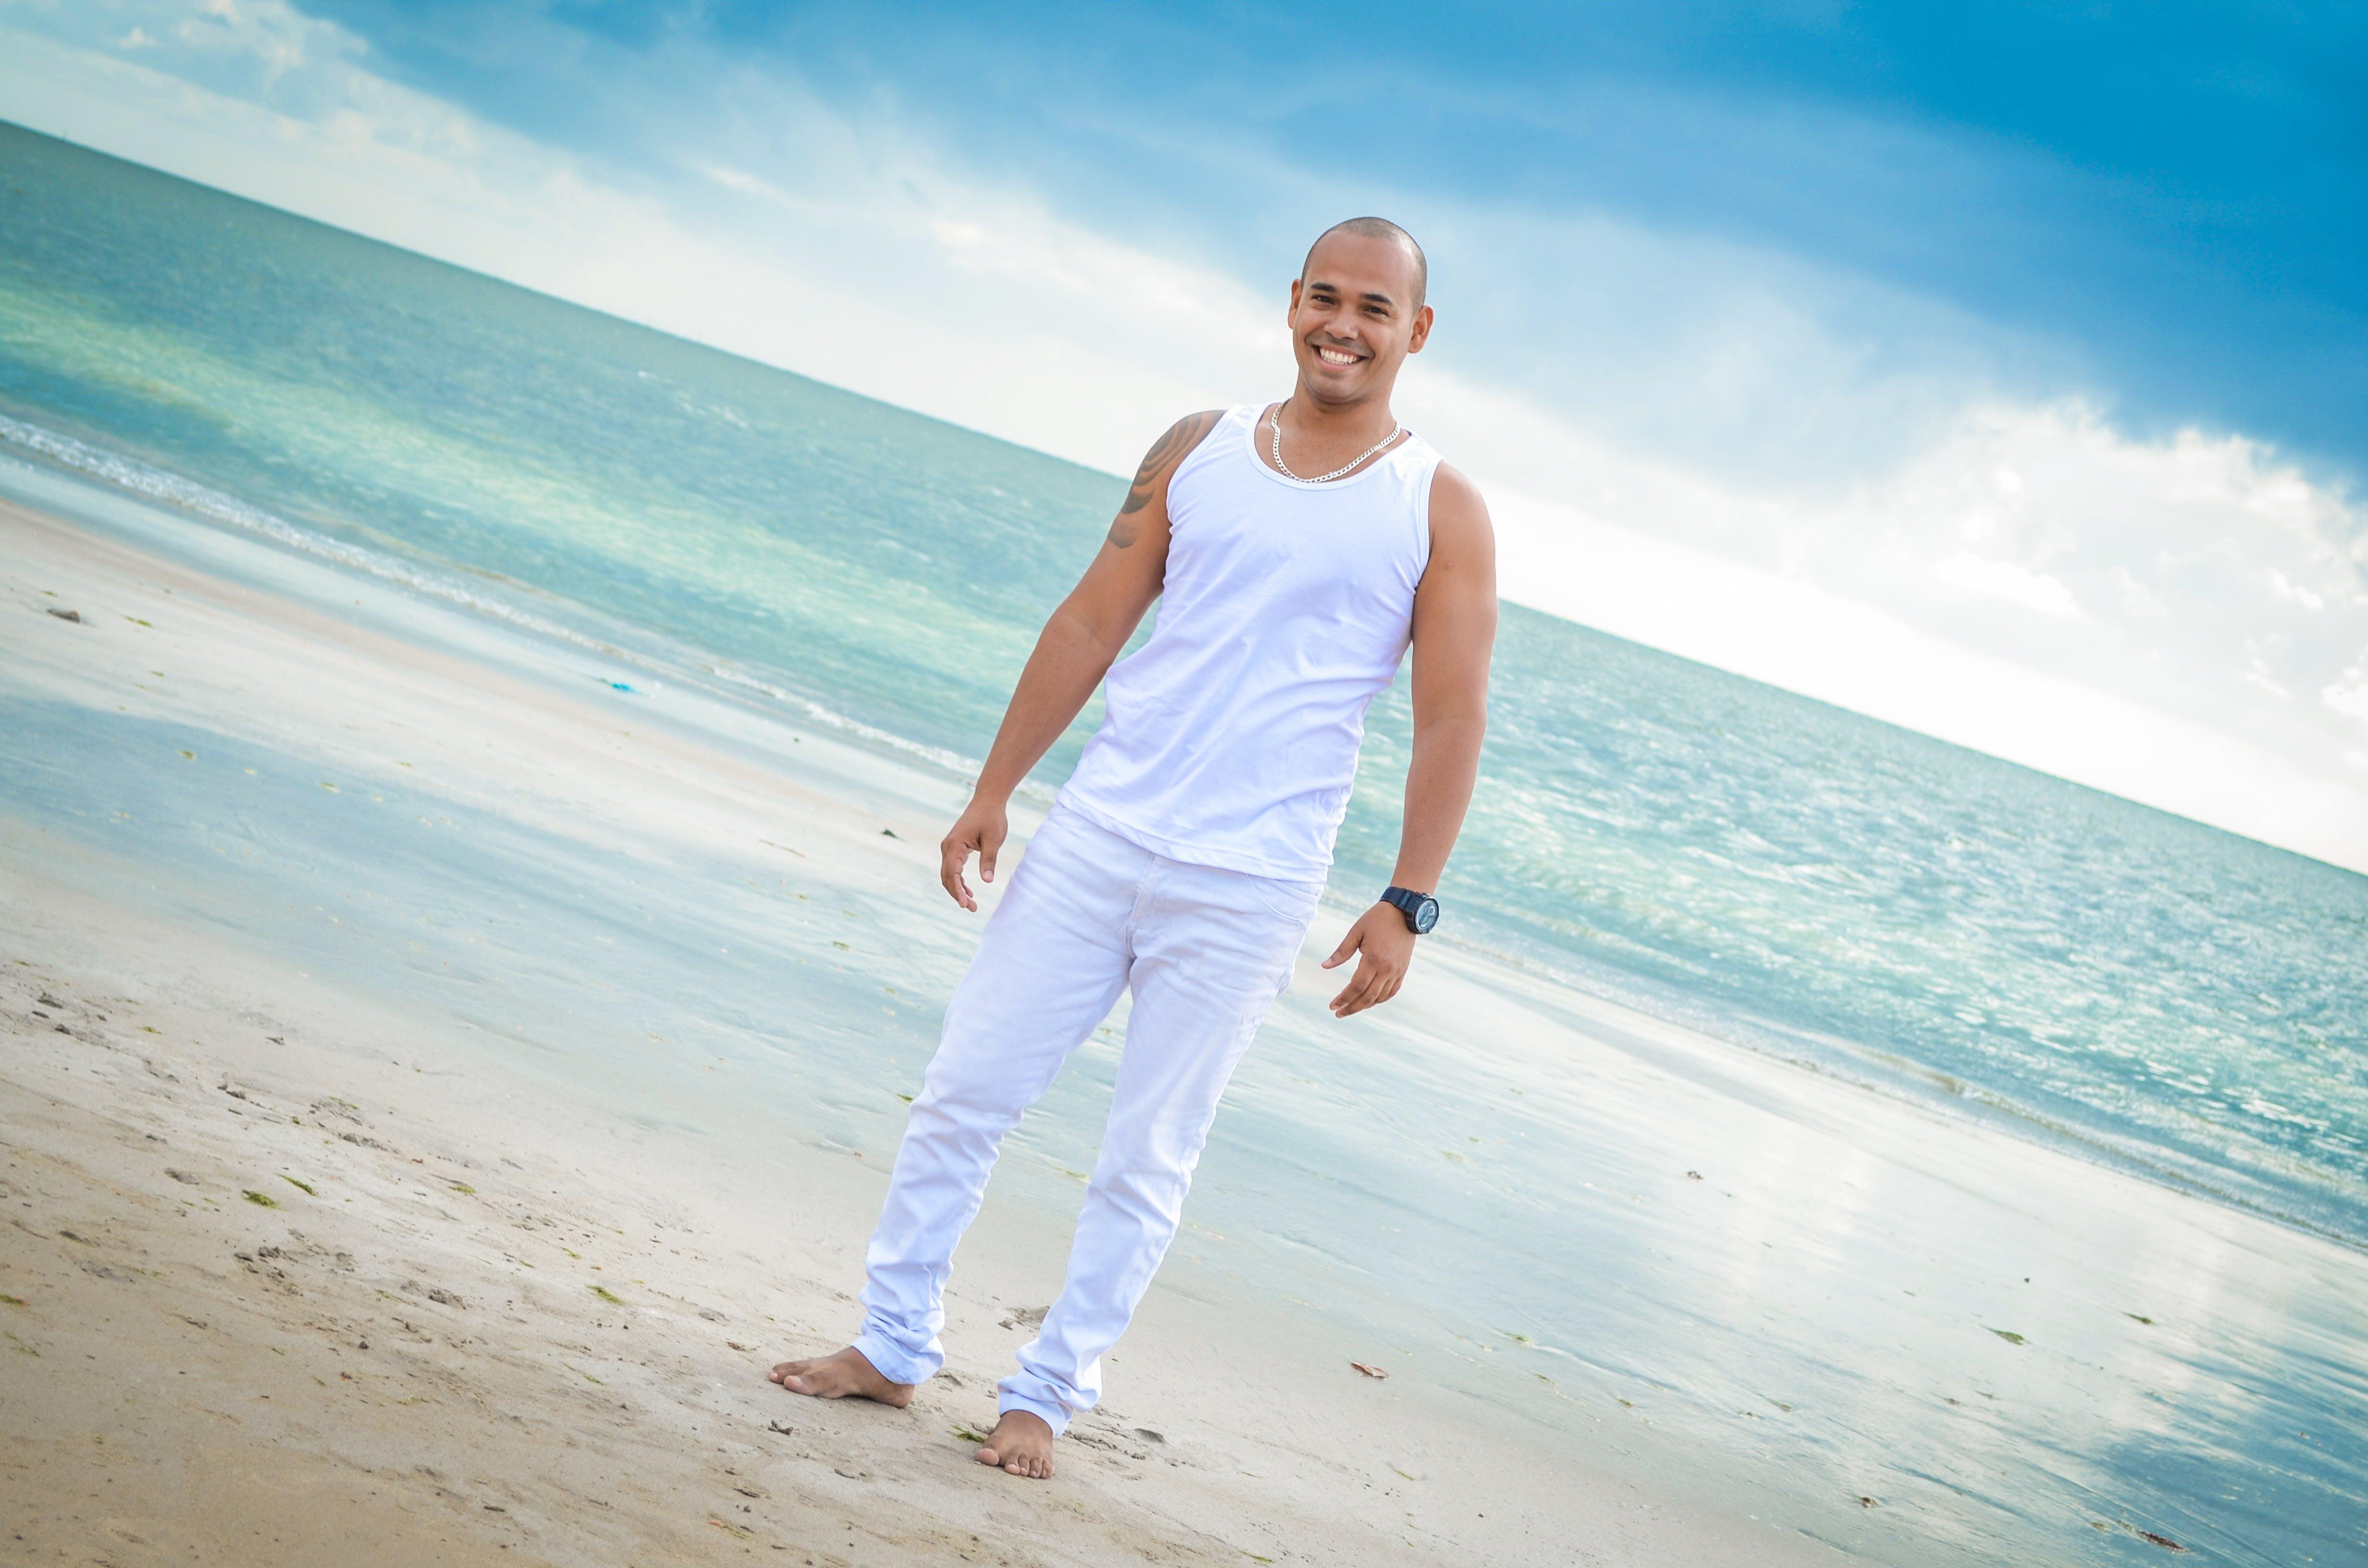 Free stock photo of beach, beachlife, life, man